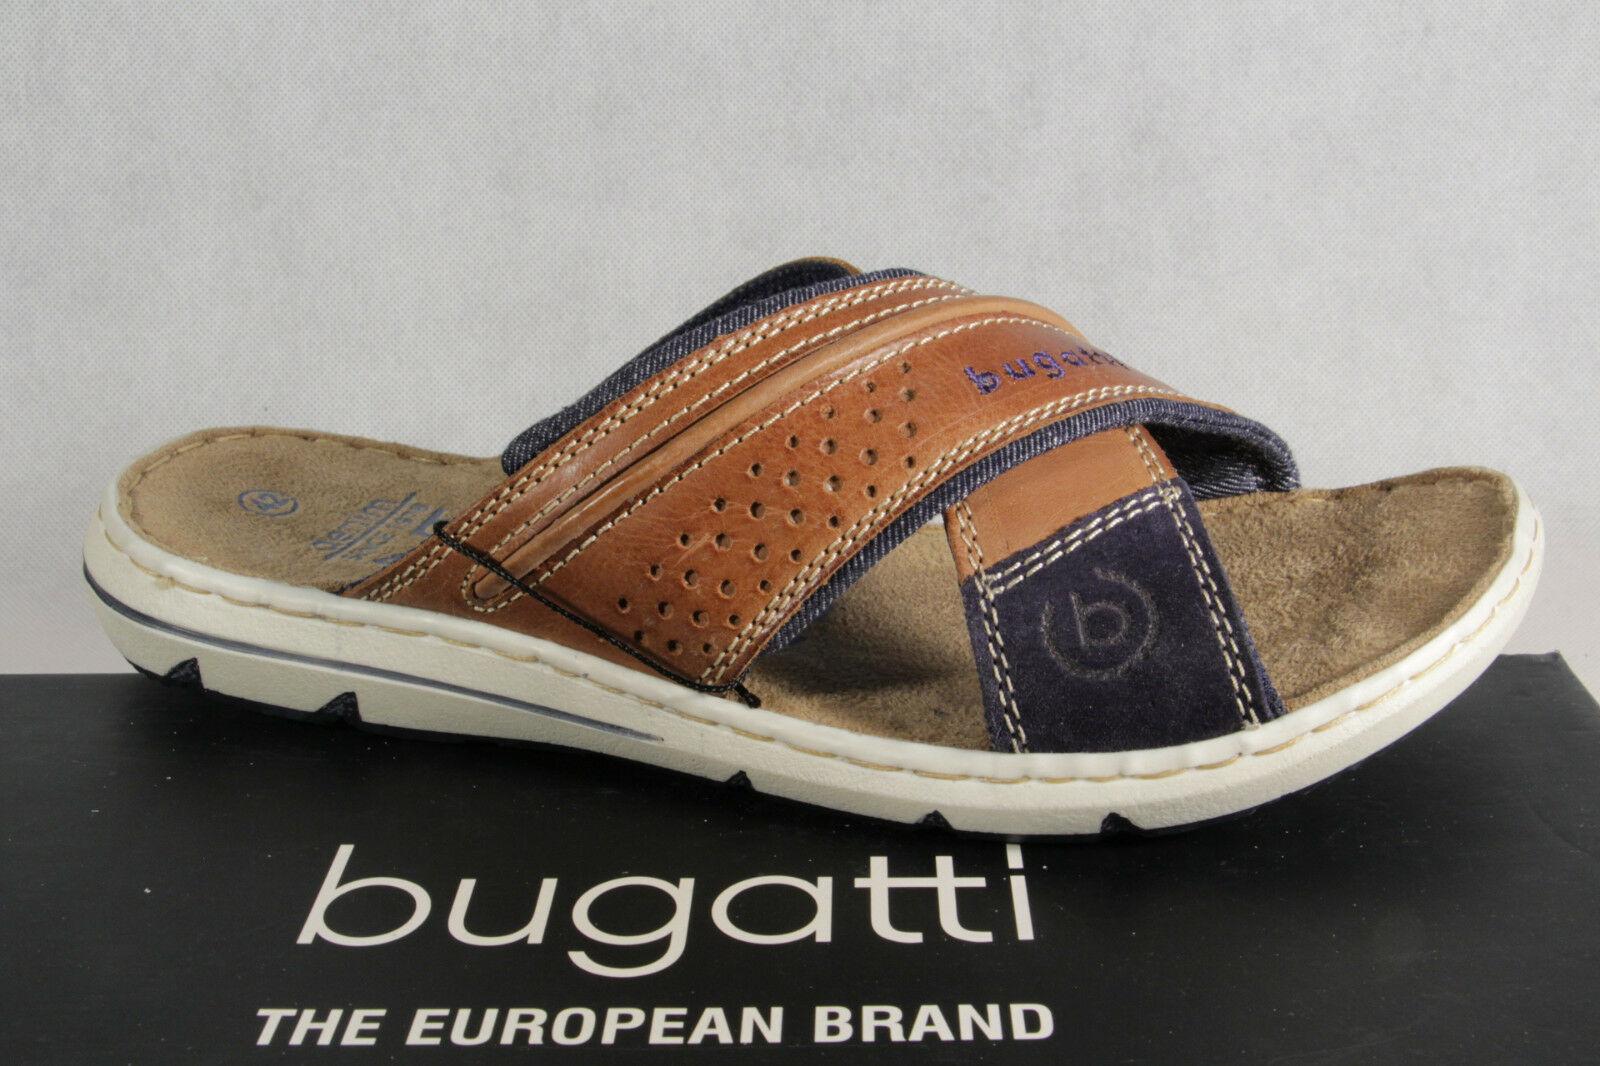 Bugatti Schuhe blau grau Mesh atmungsaktiv extra light